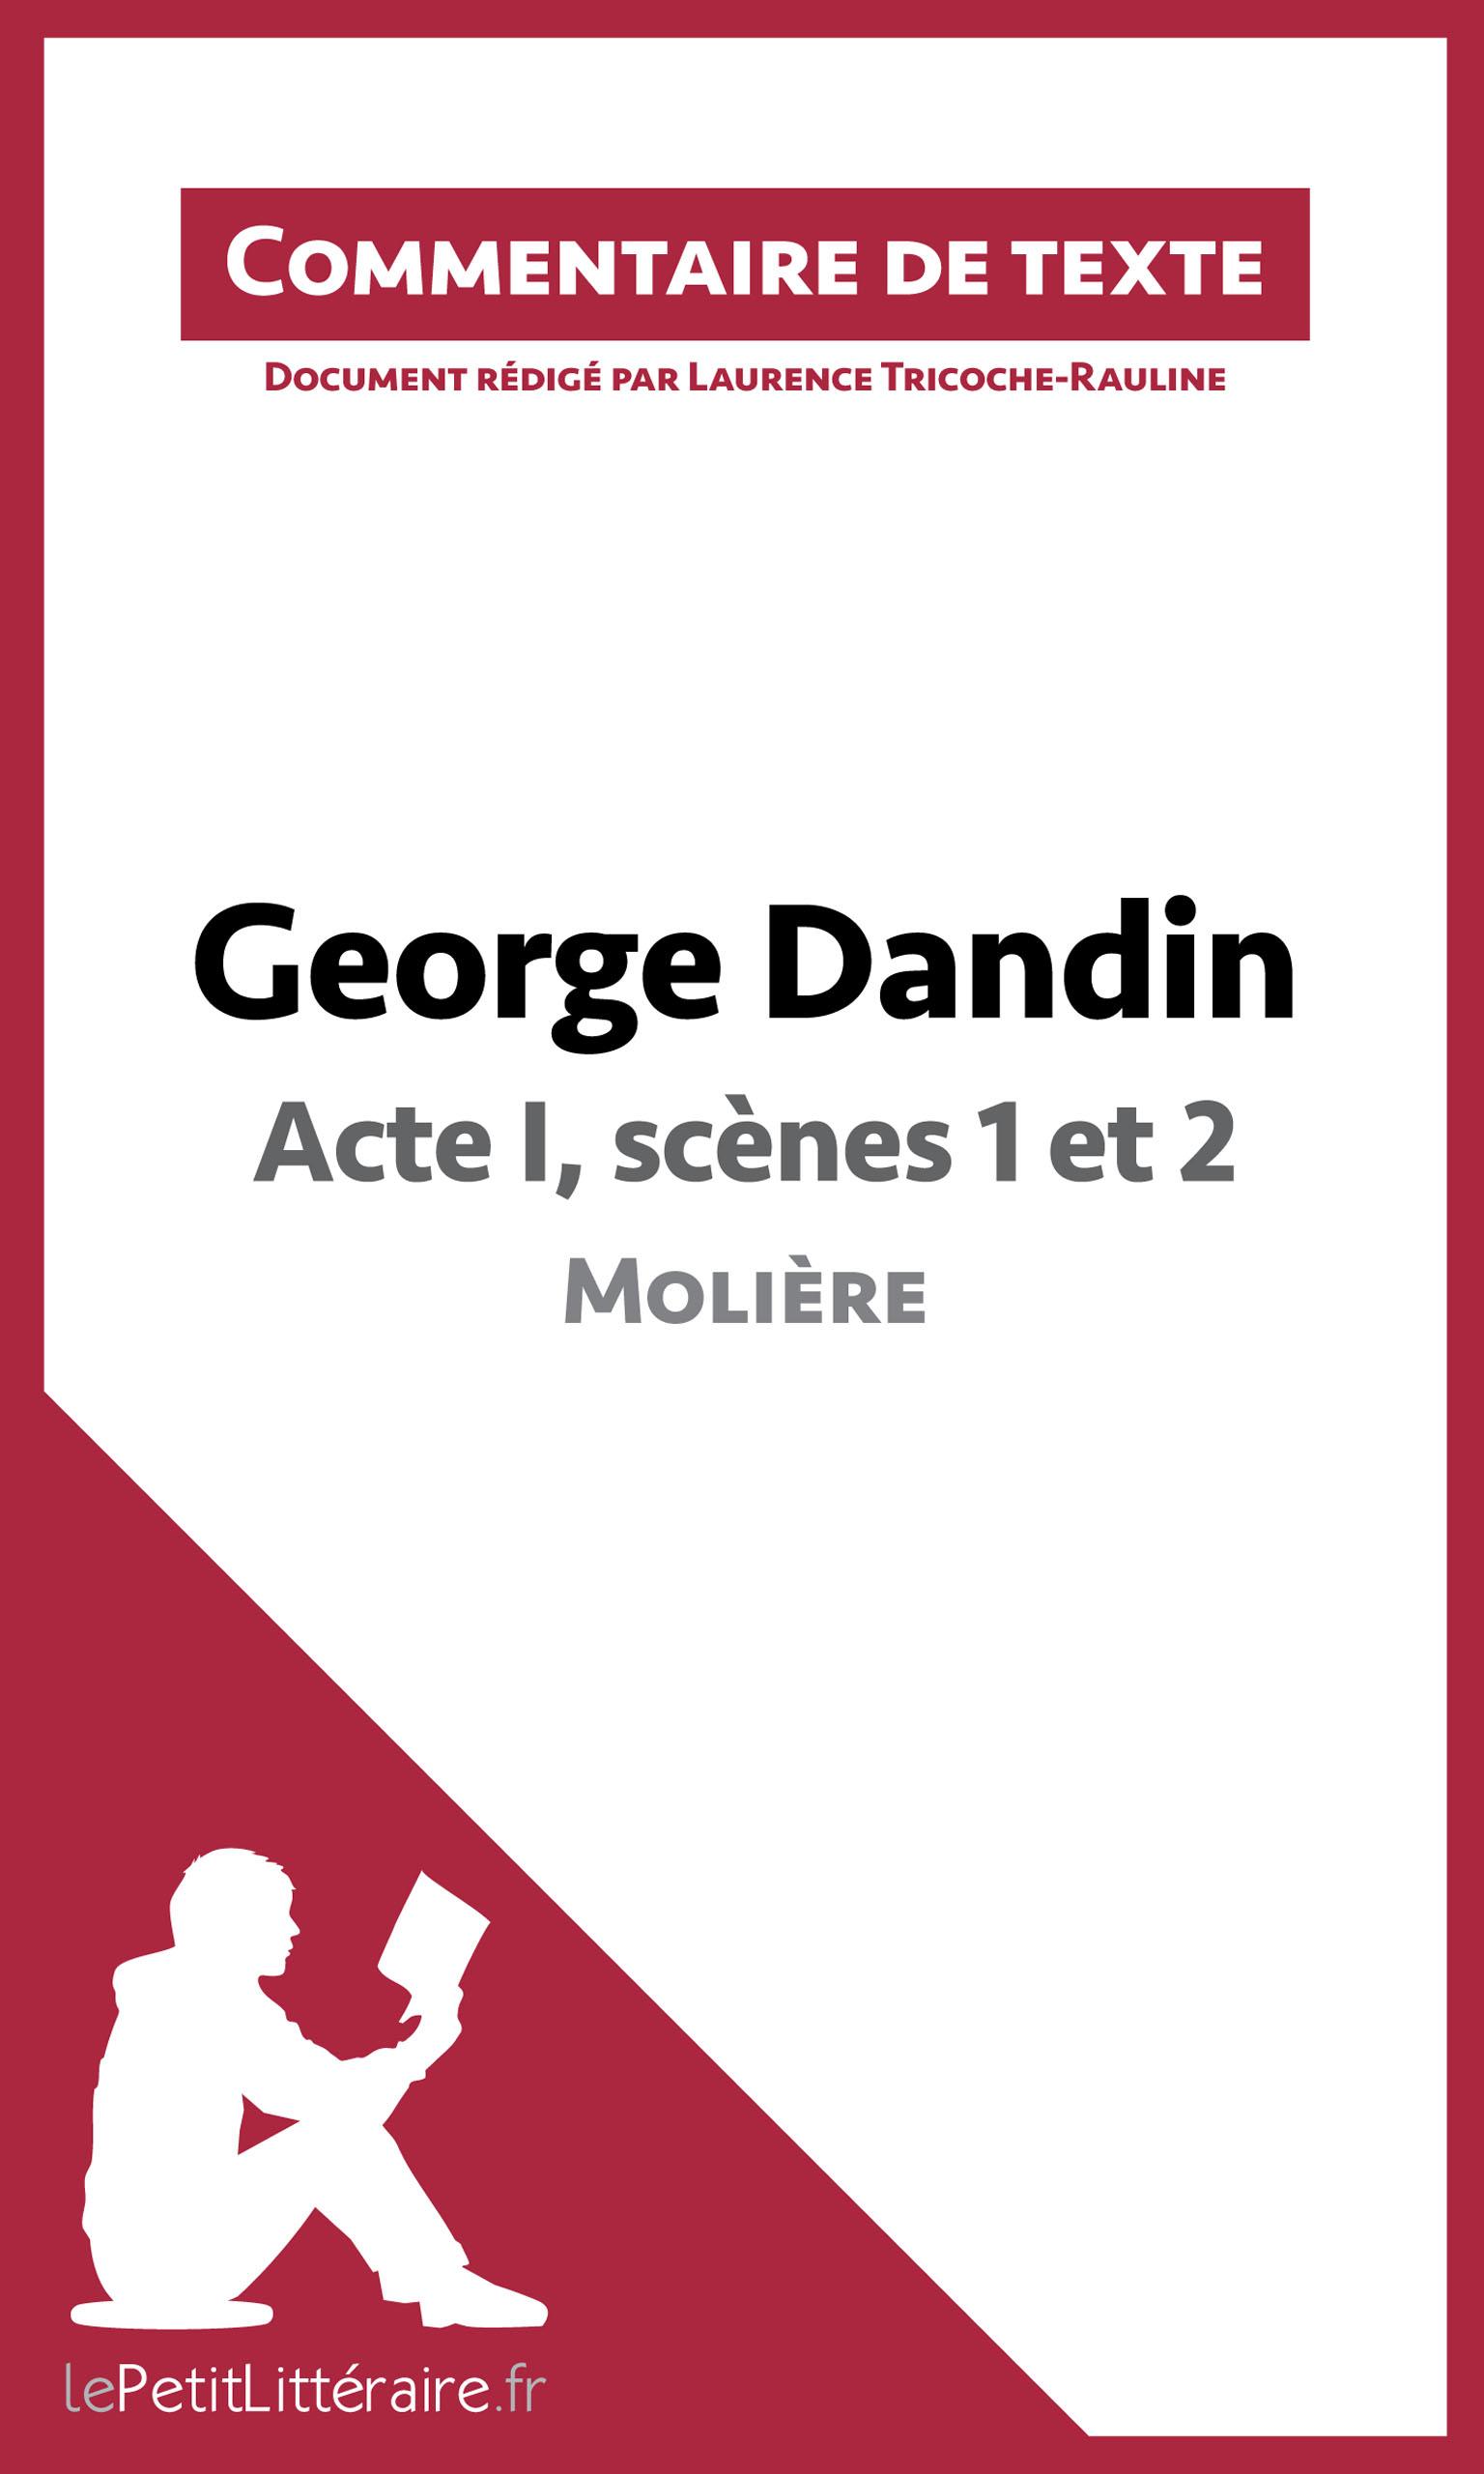 Acte I, scènes 1 et 2